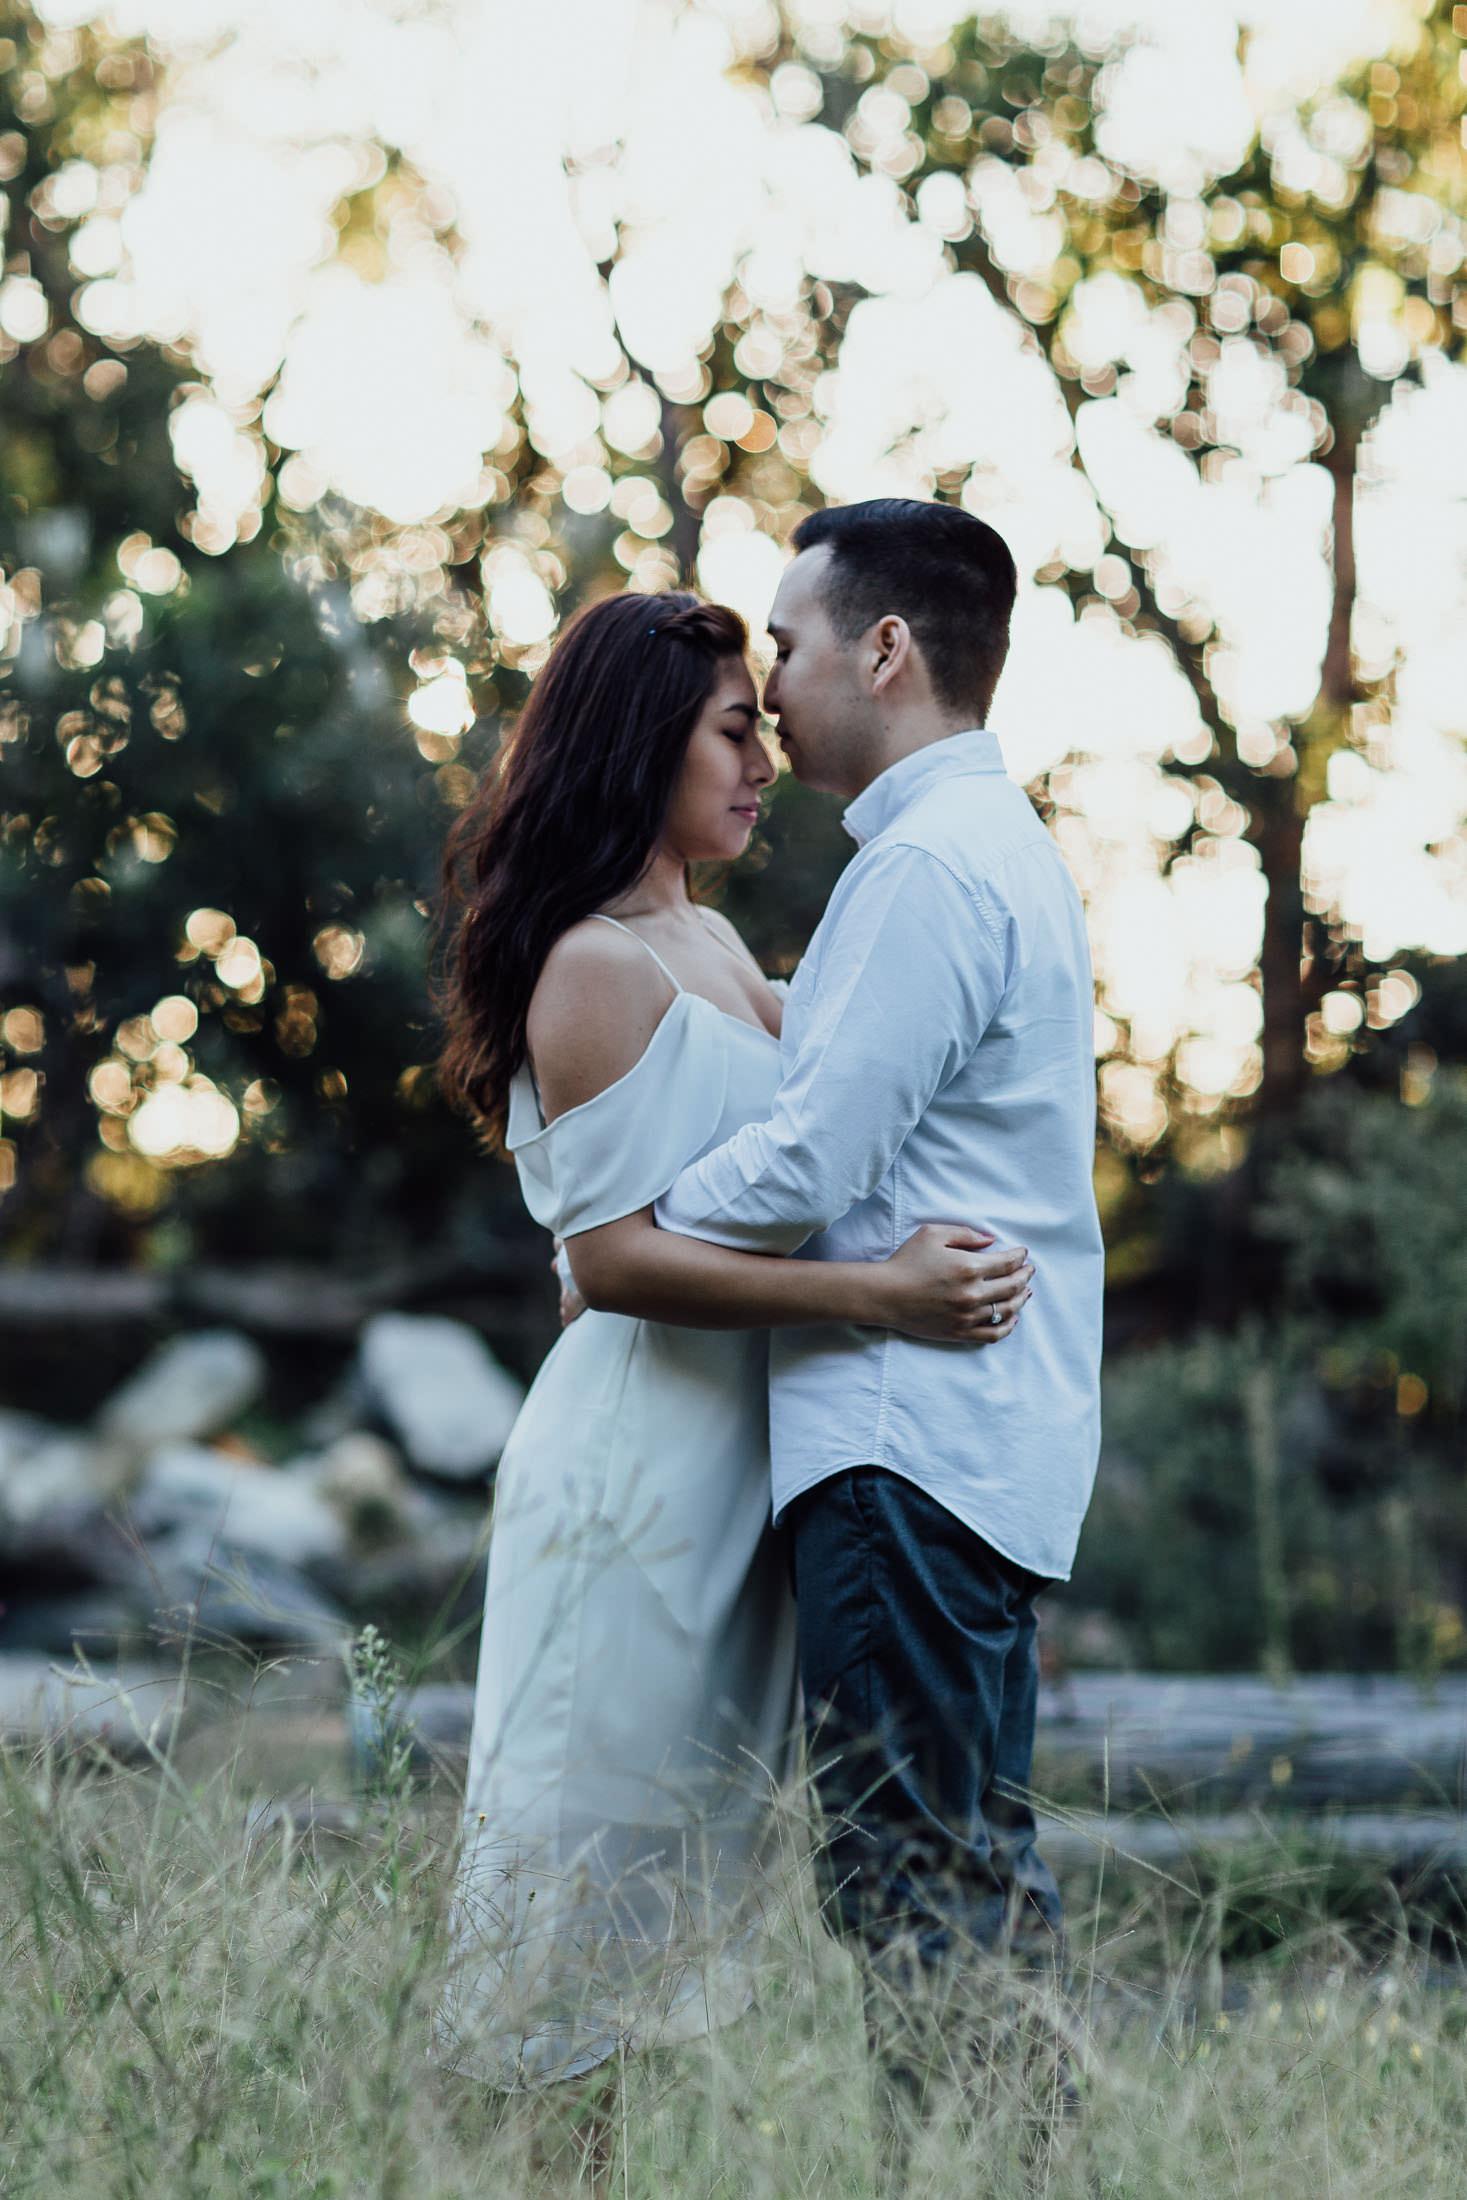 Watsons-Bay-Engagement-Photography-SonjaC-16